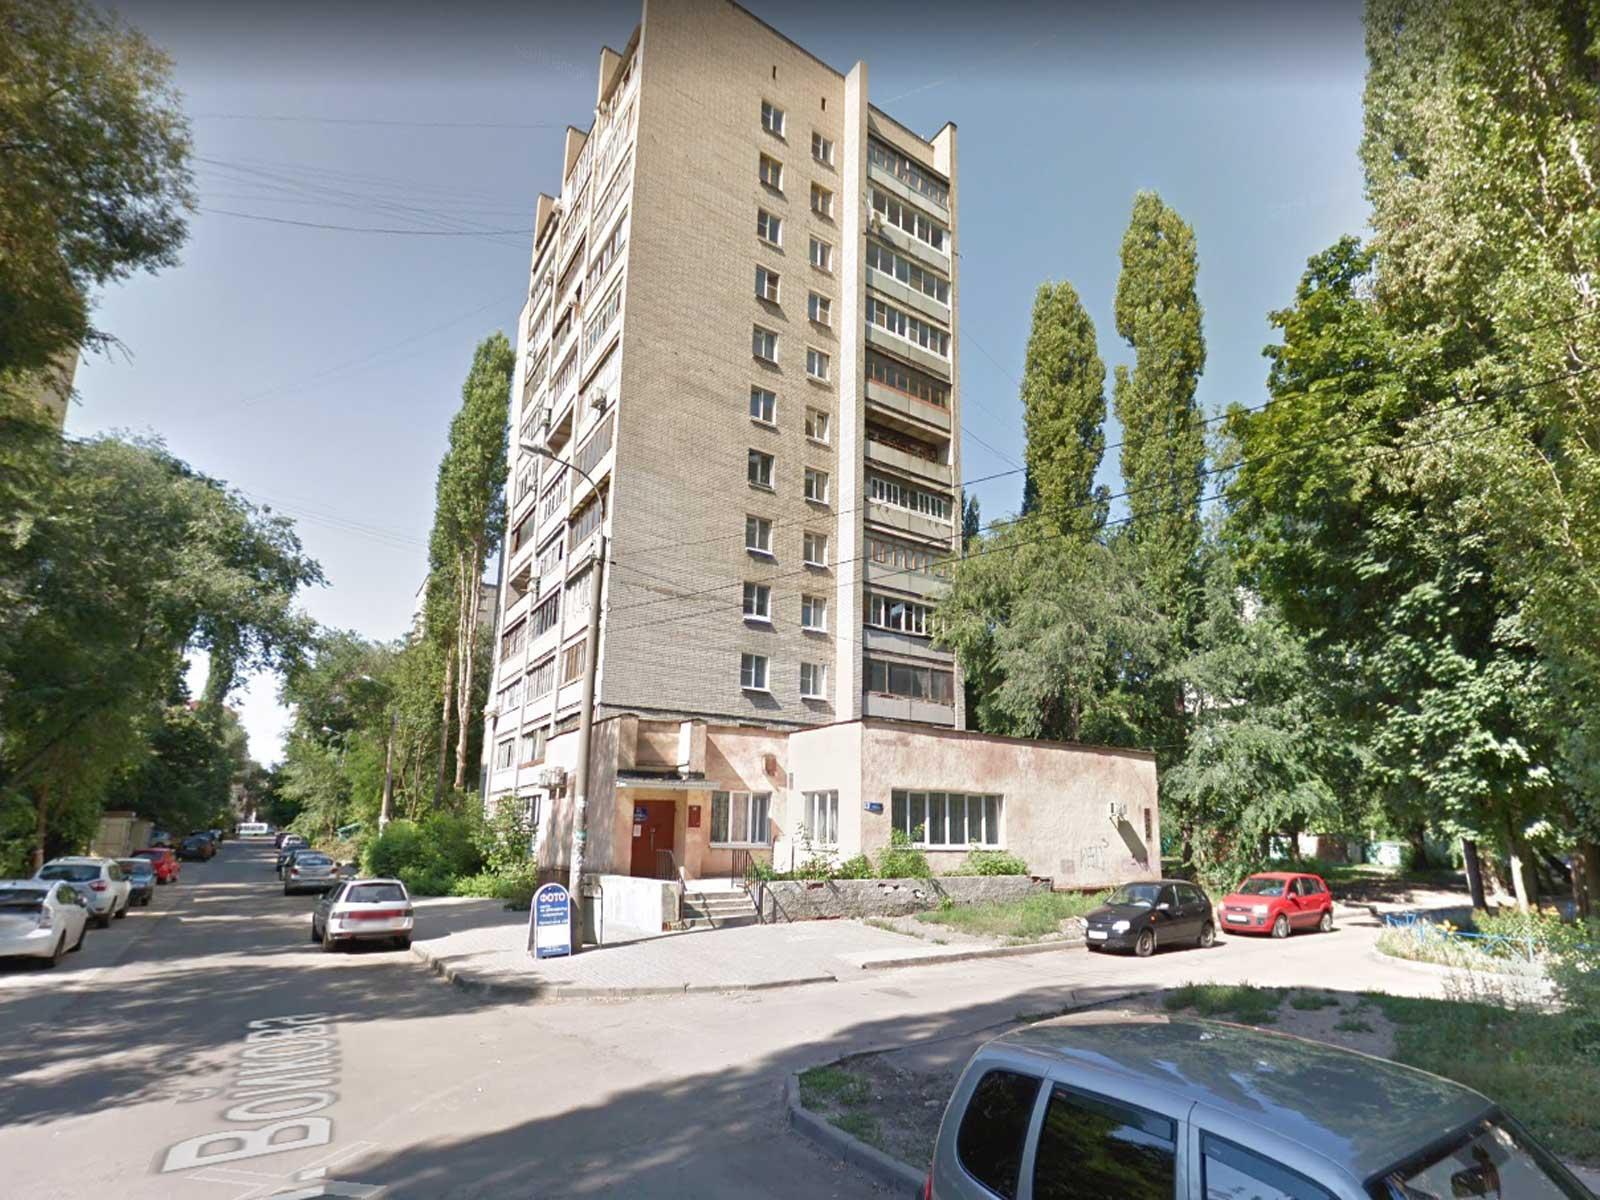 Вид на здание УФМС по Центральному району, Воронеж